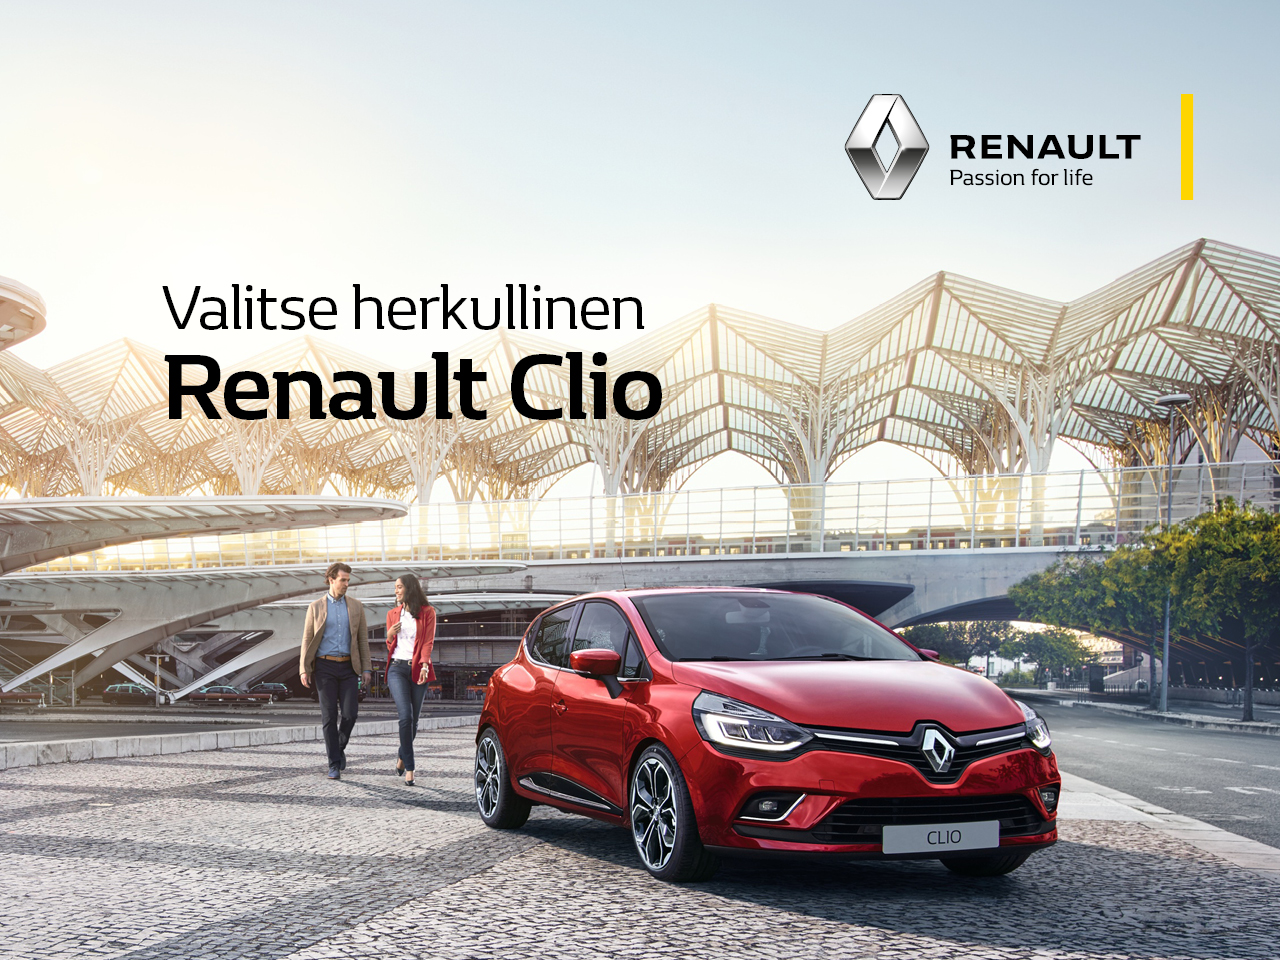 Herkullinen Renault Clio kampanjahintaan